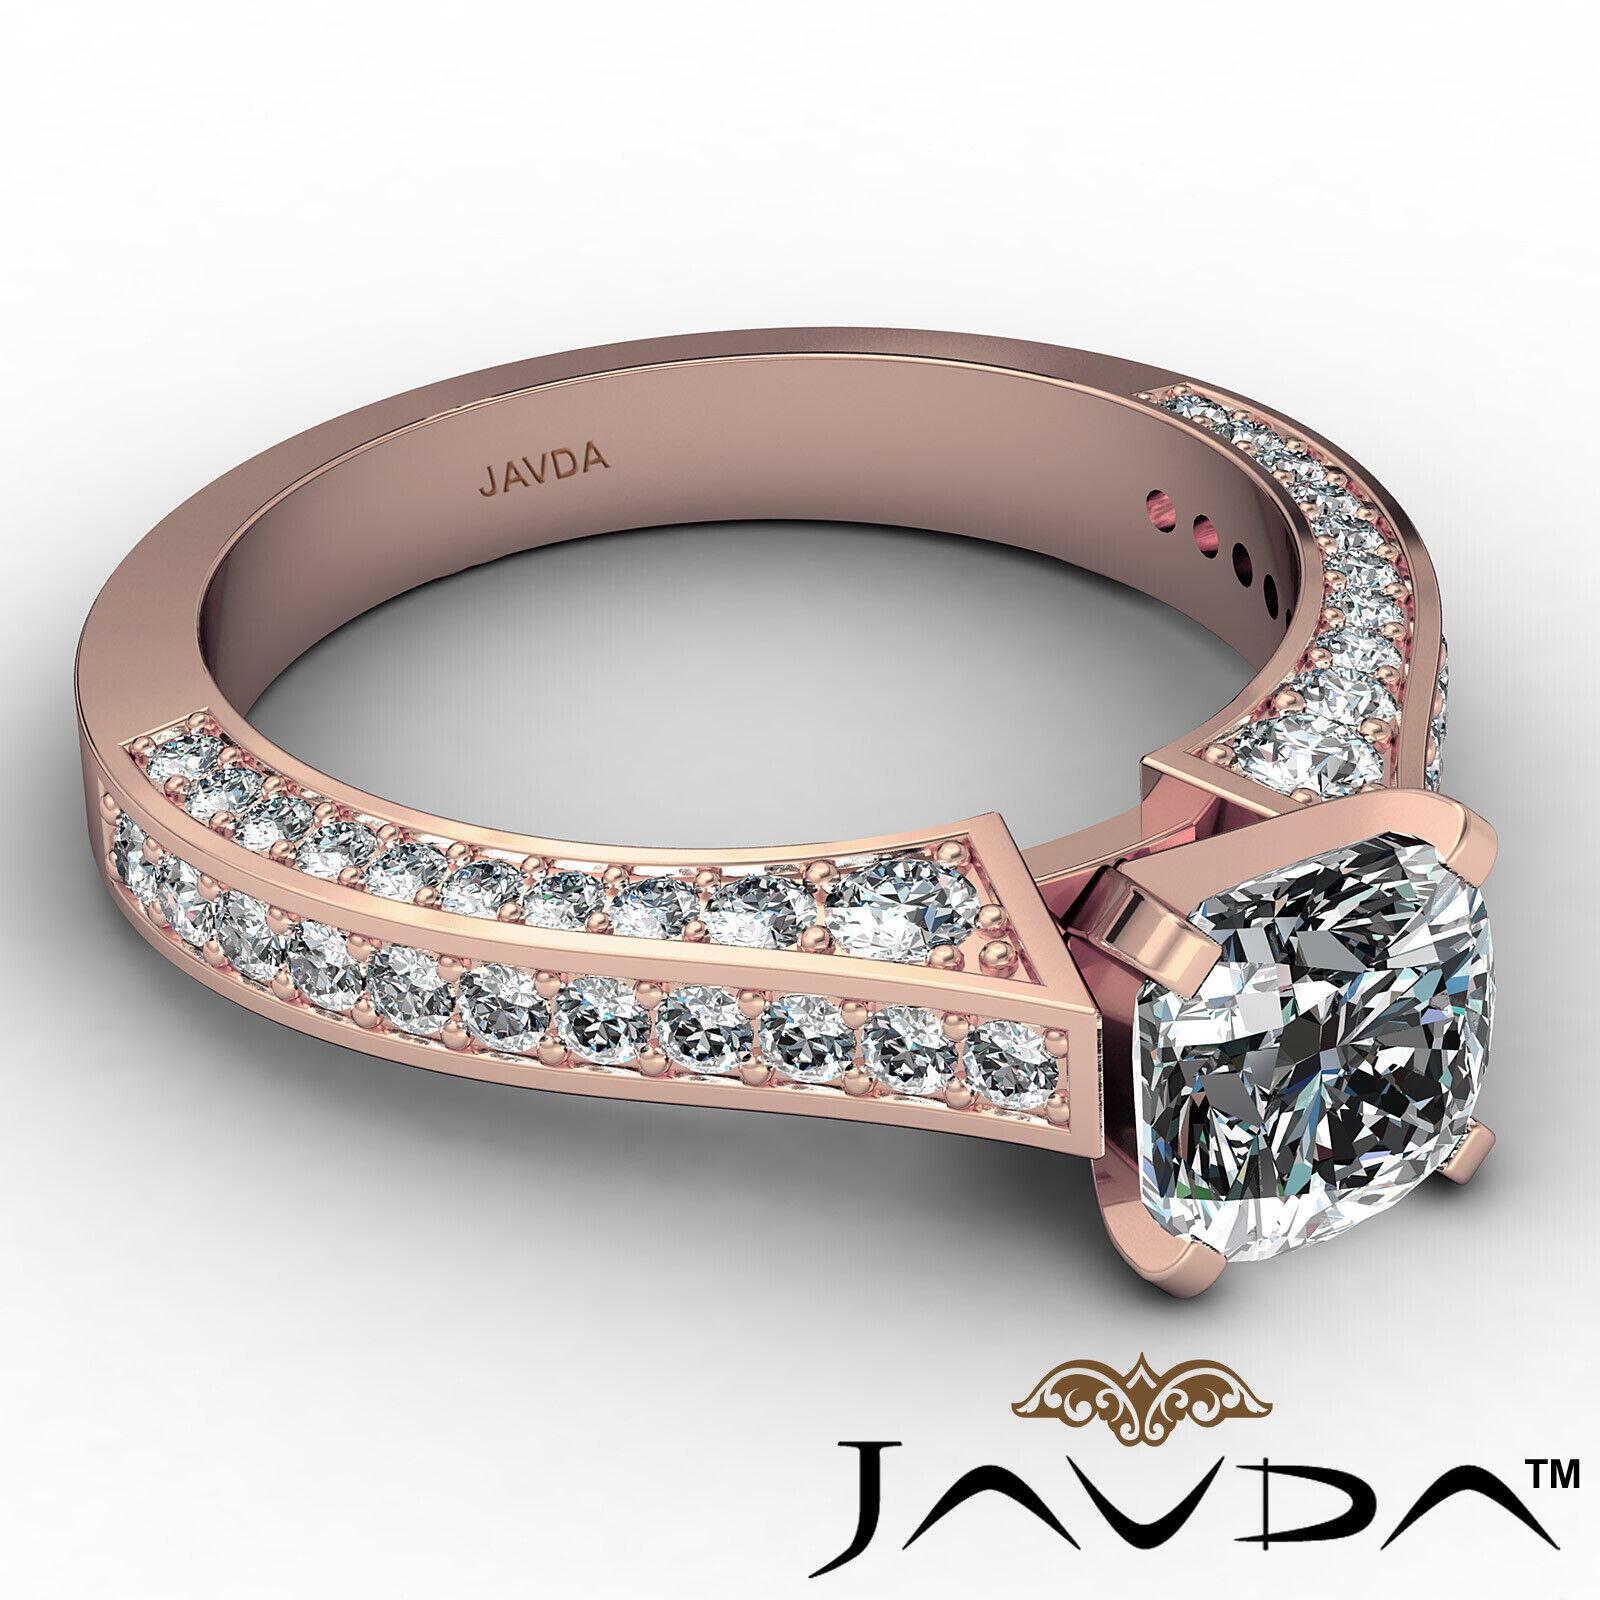 Cushion Diamond Engagement Pave Set Ring GIA J Color & VS2 clarity 1.82ctw 8